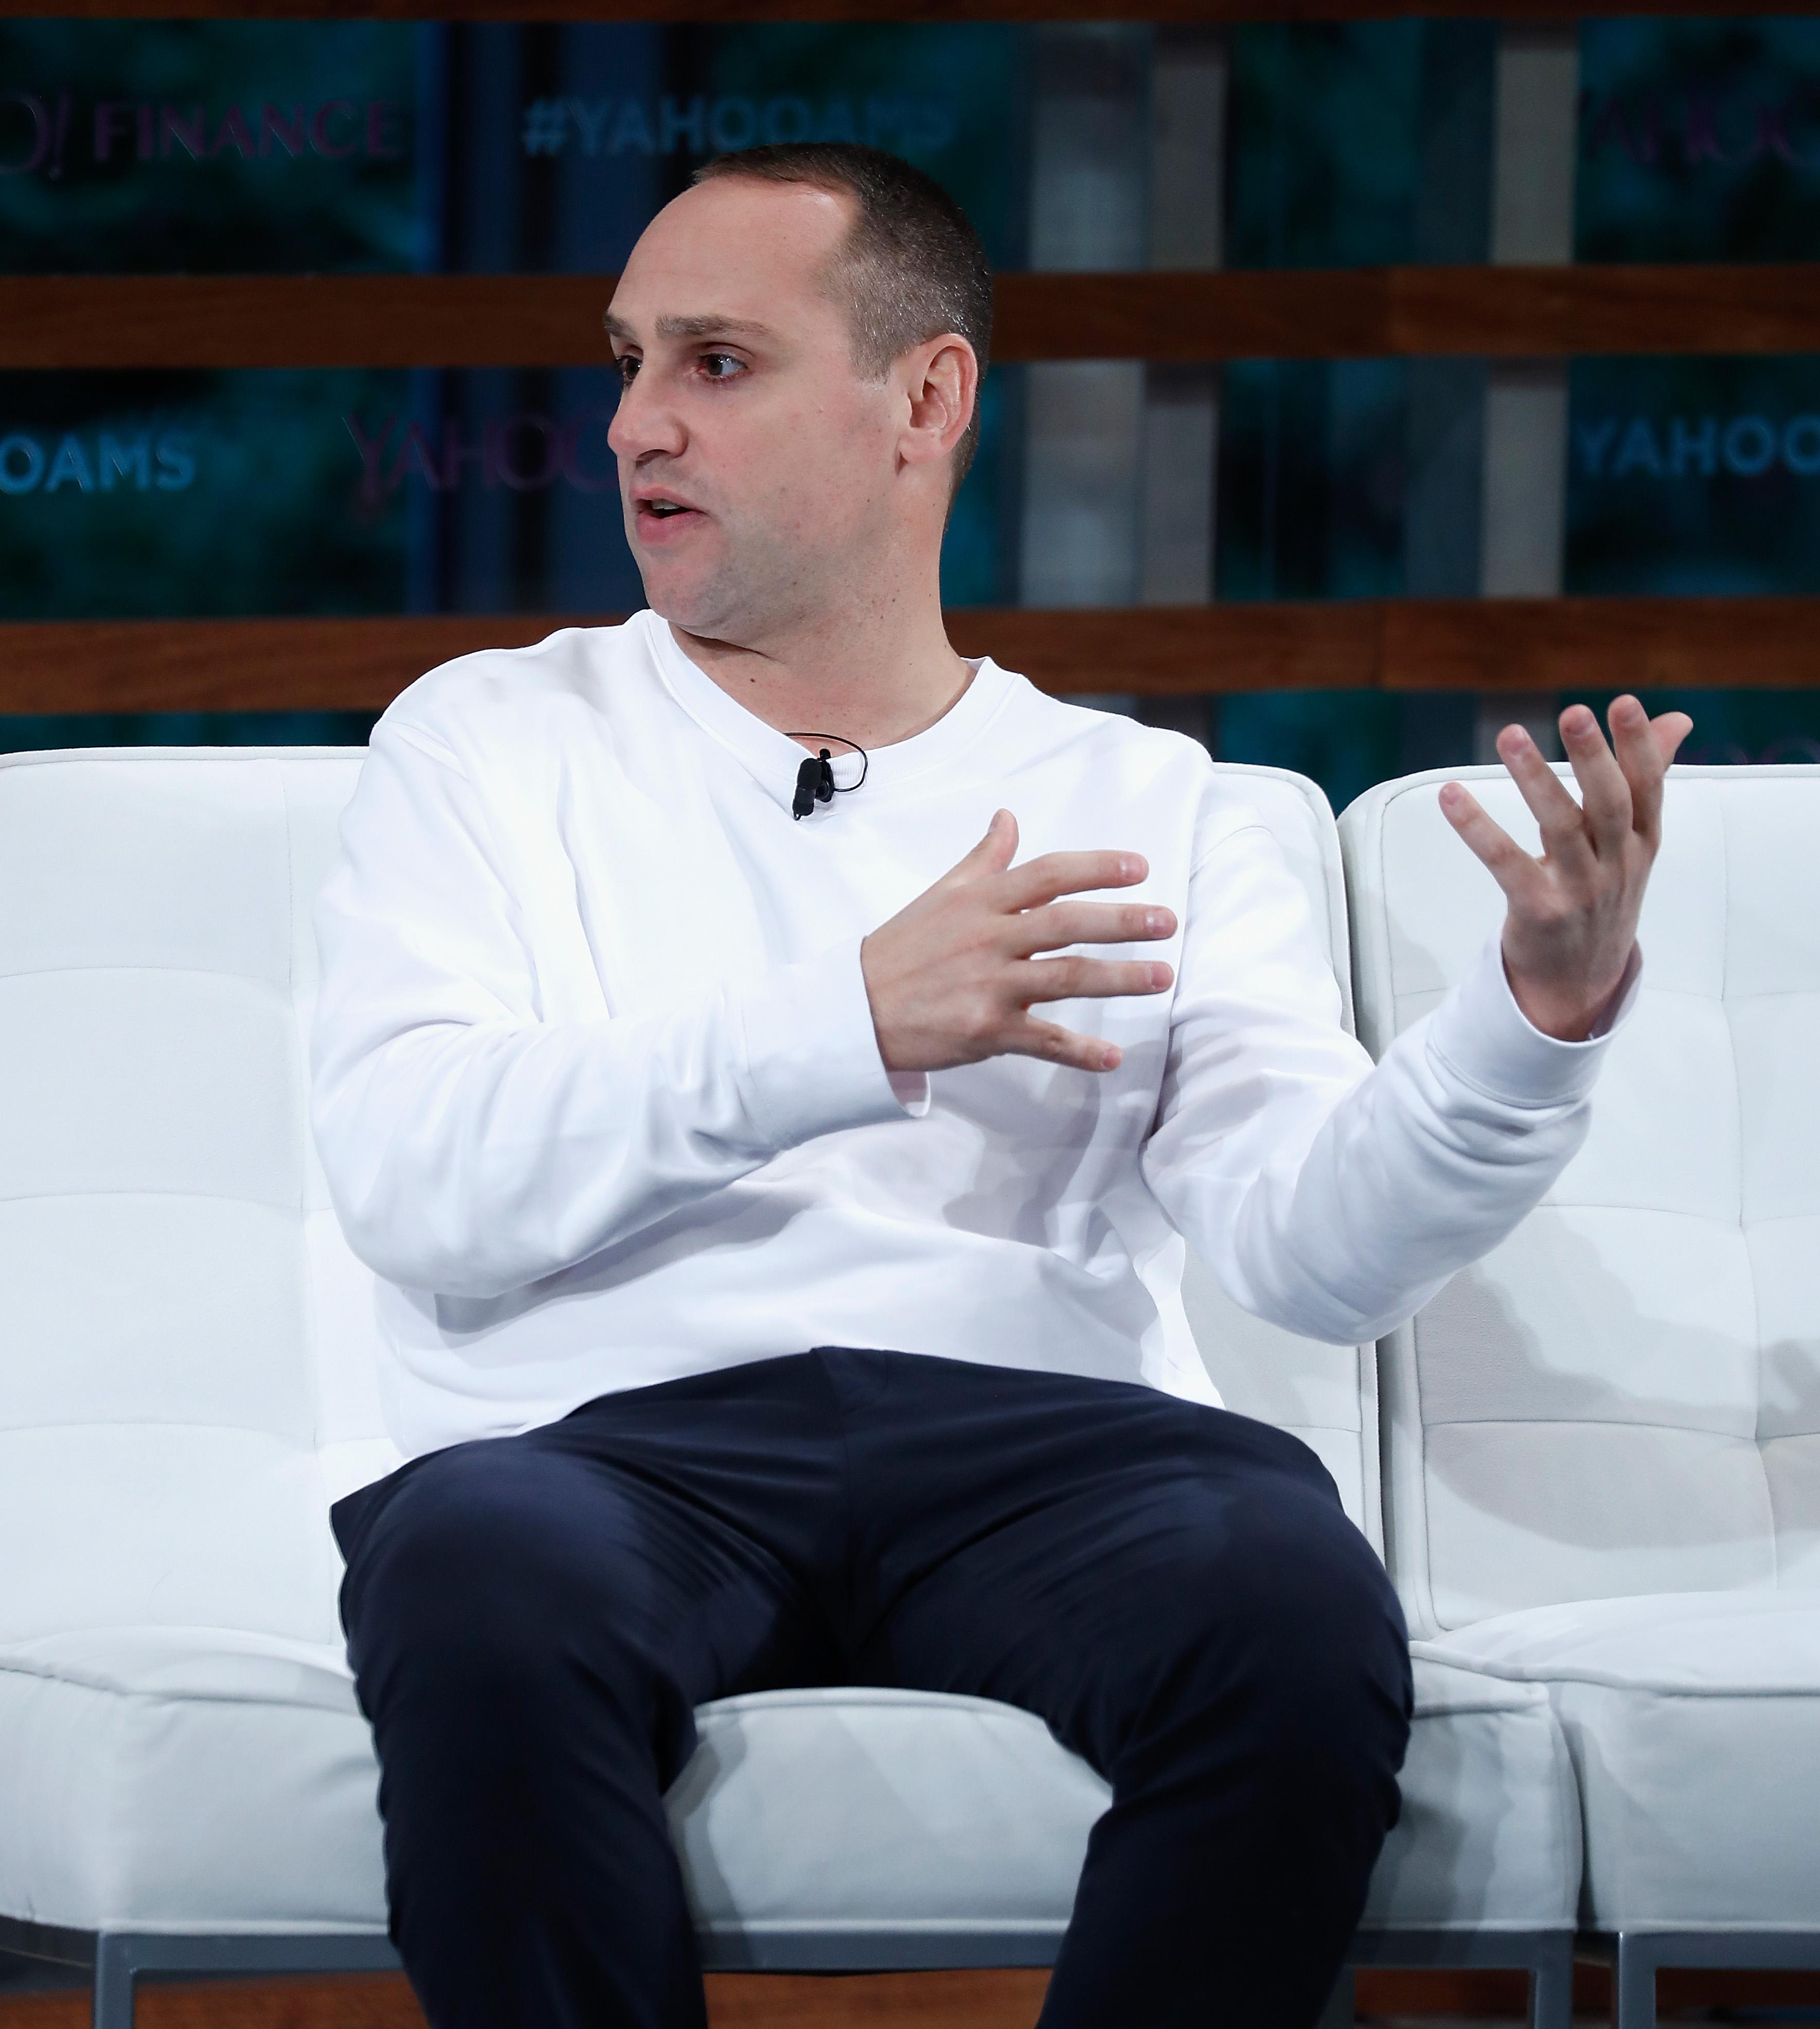 ShopRunner founder Michael Rubin at the 2018 Yahoo Finance All Markets Summit